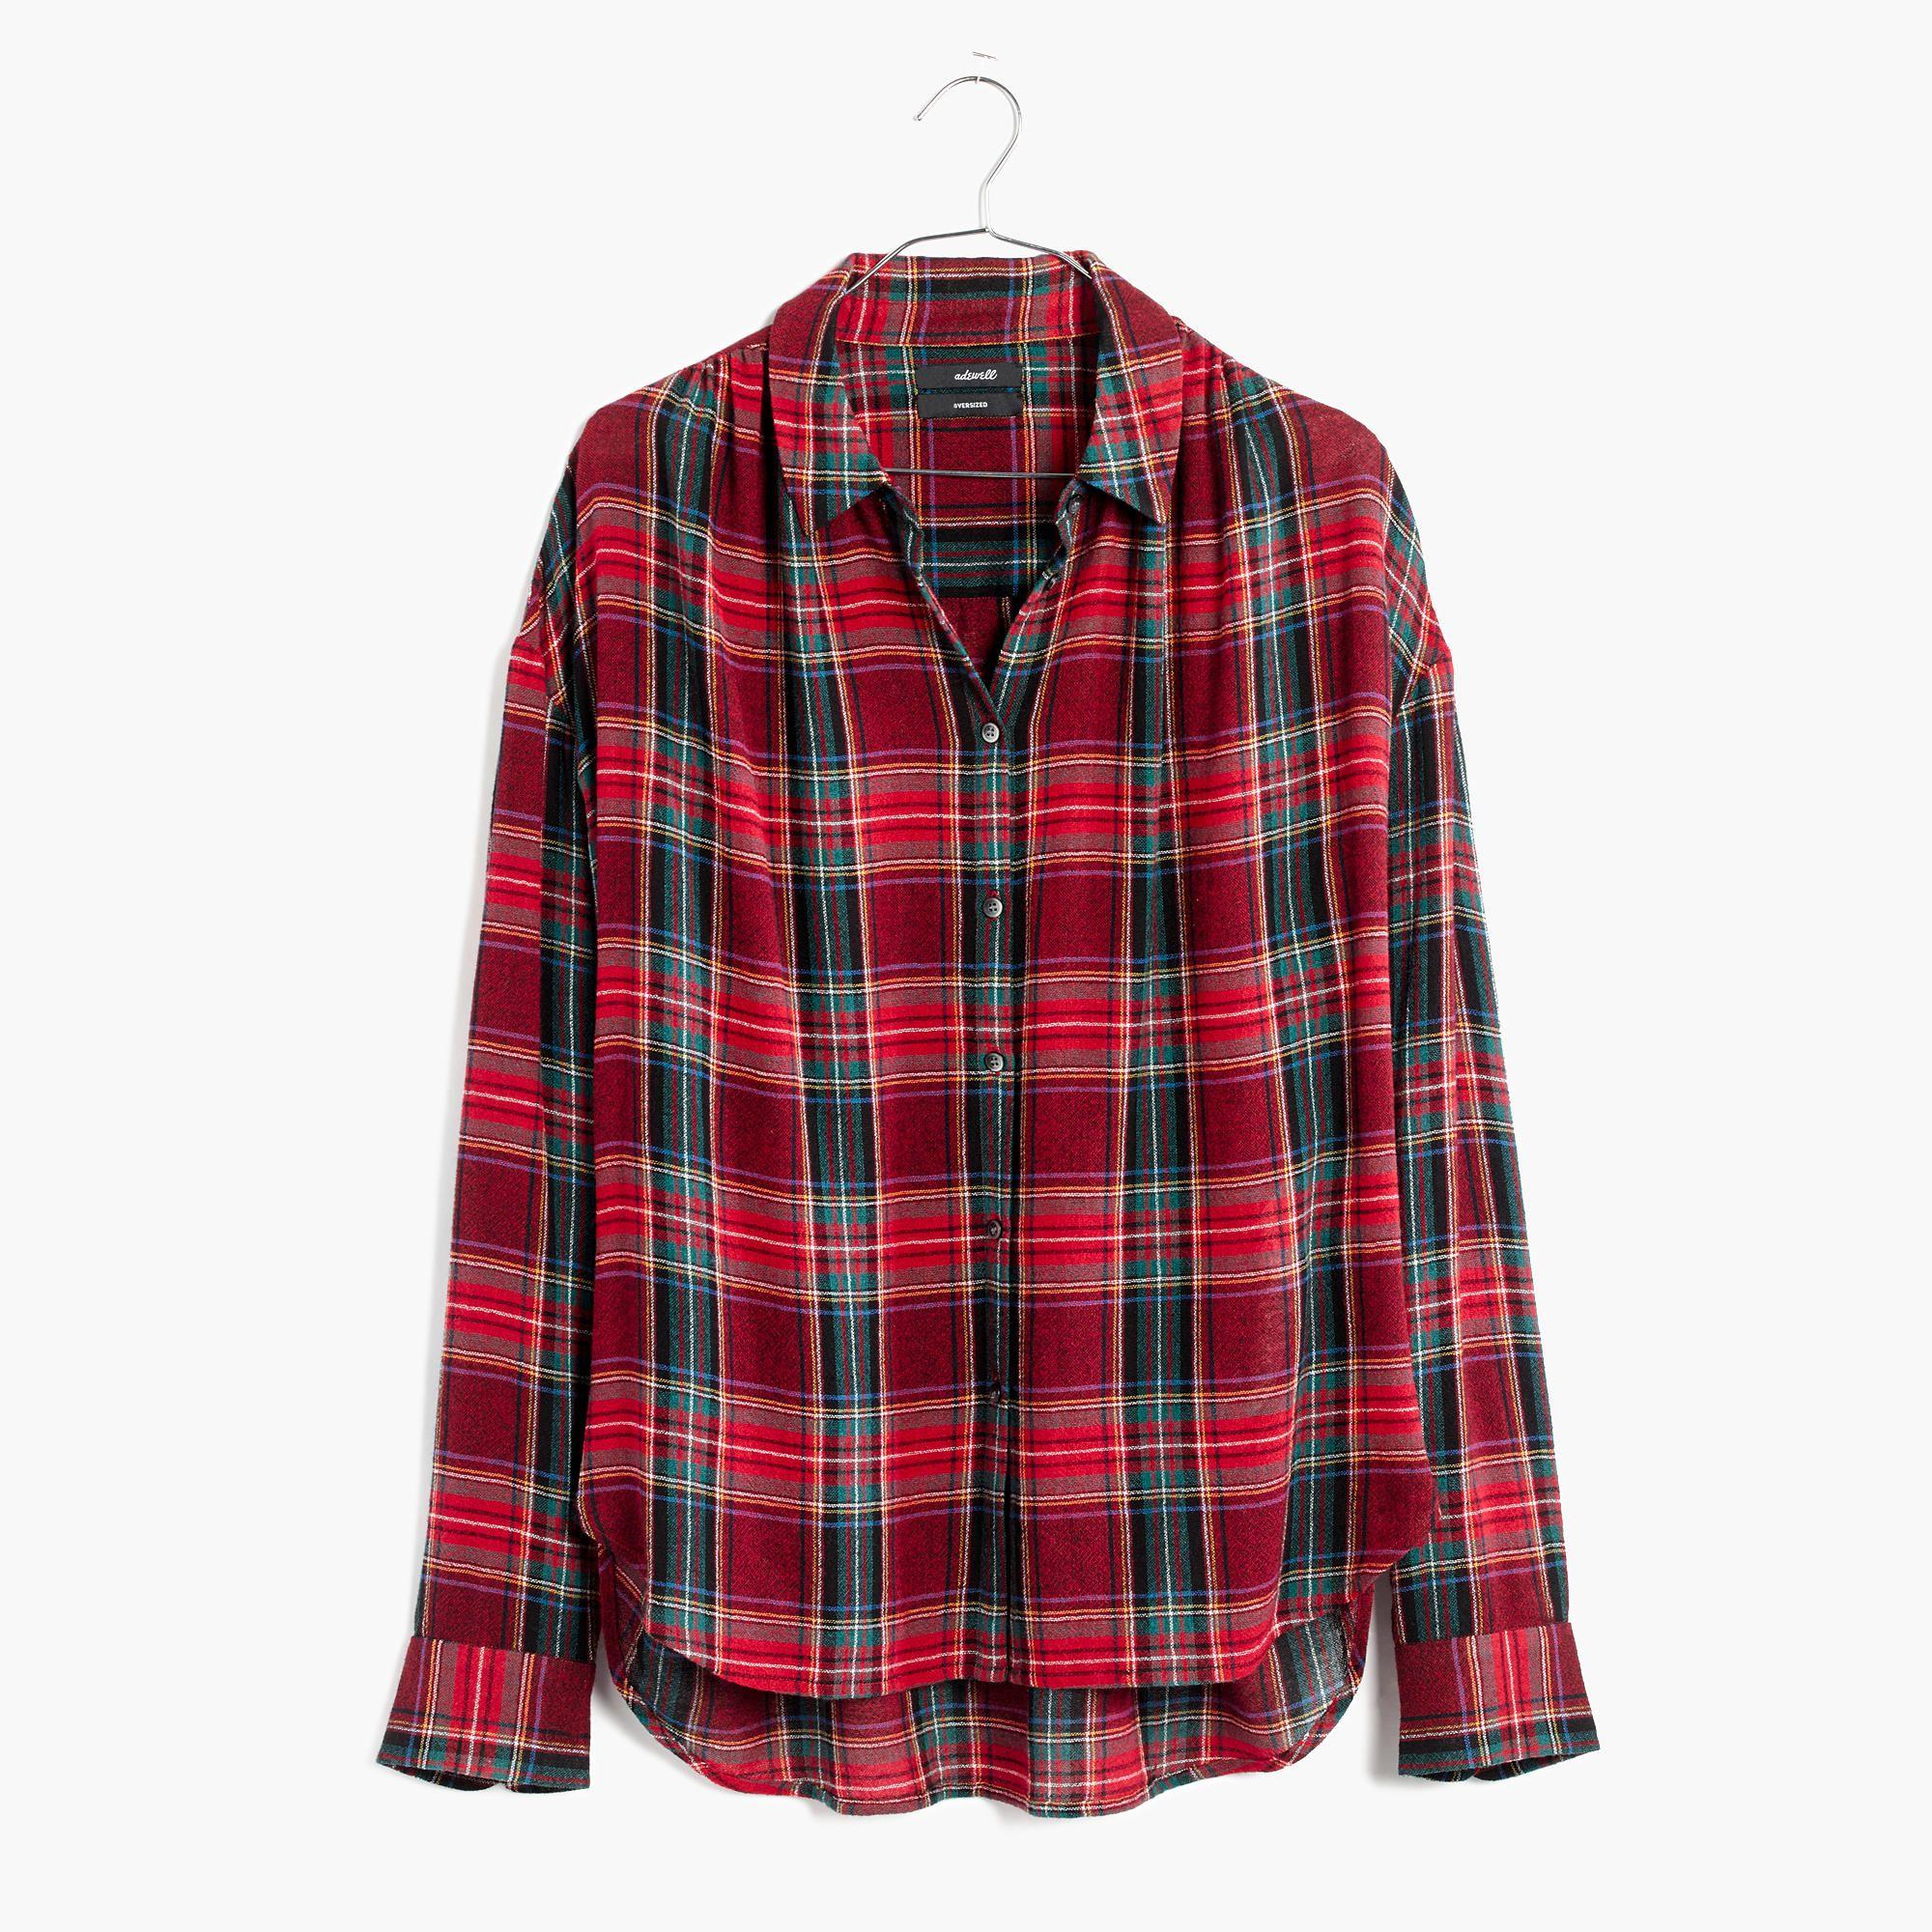 Button up flannel shirts  Central LongSleeve Shirt in Tartan Plaid  shirts u tops  Madewell